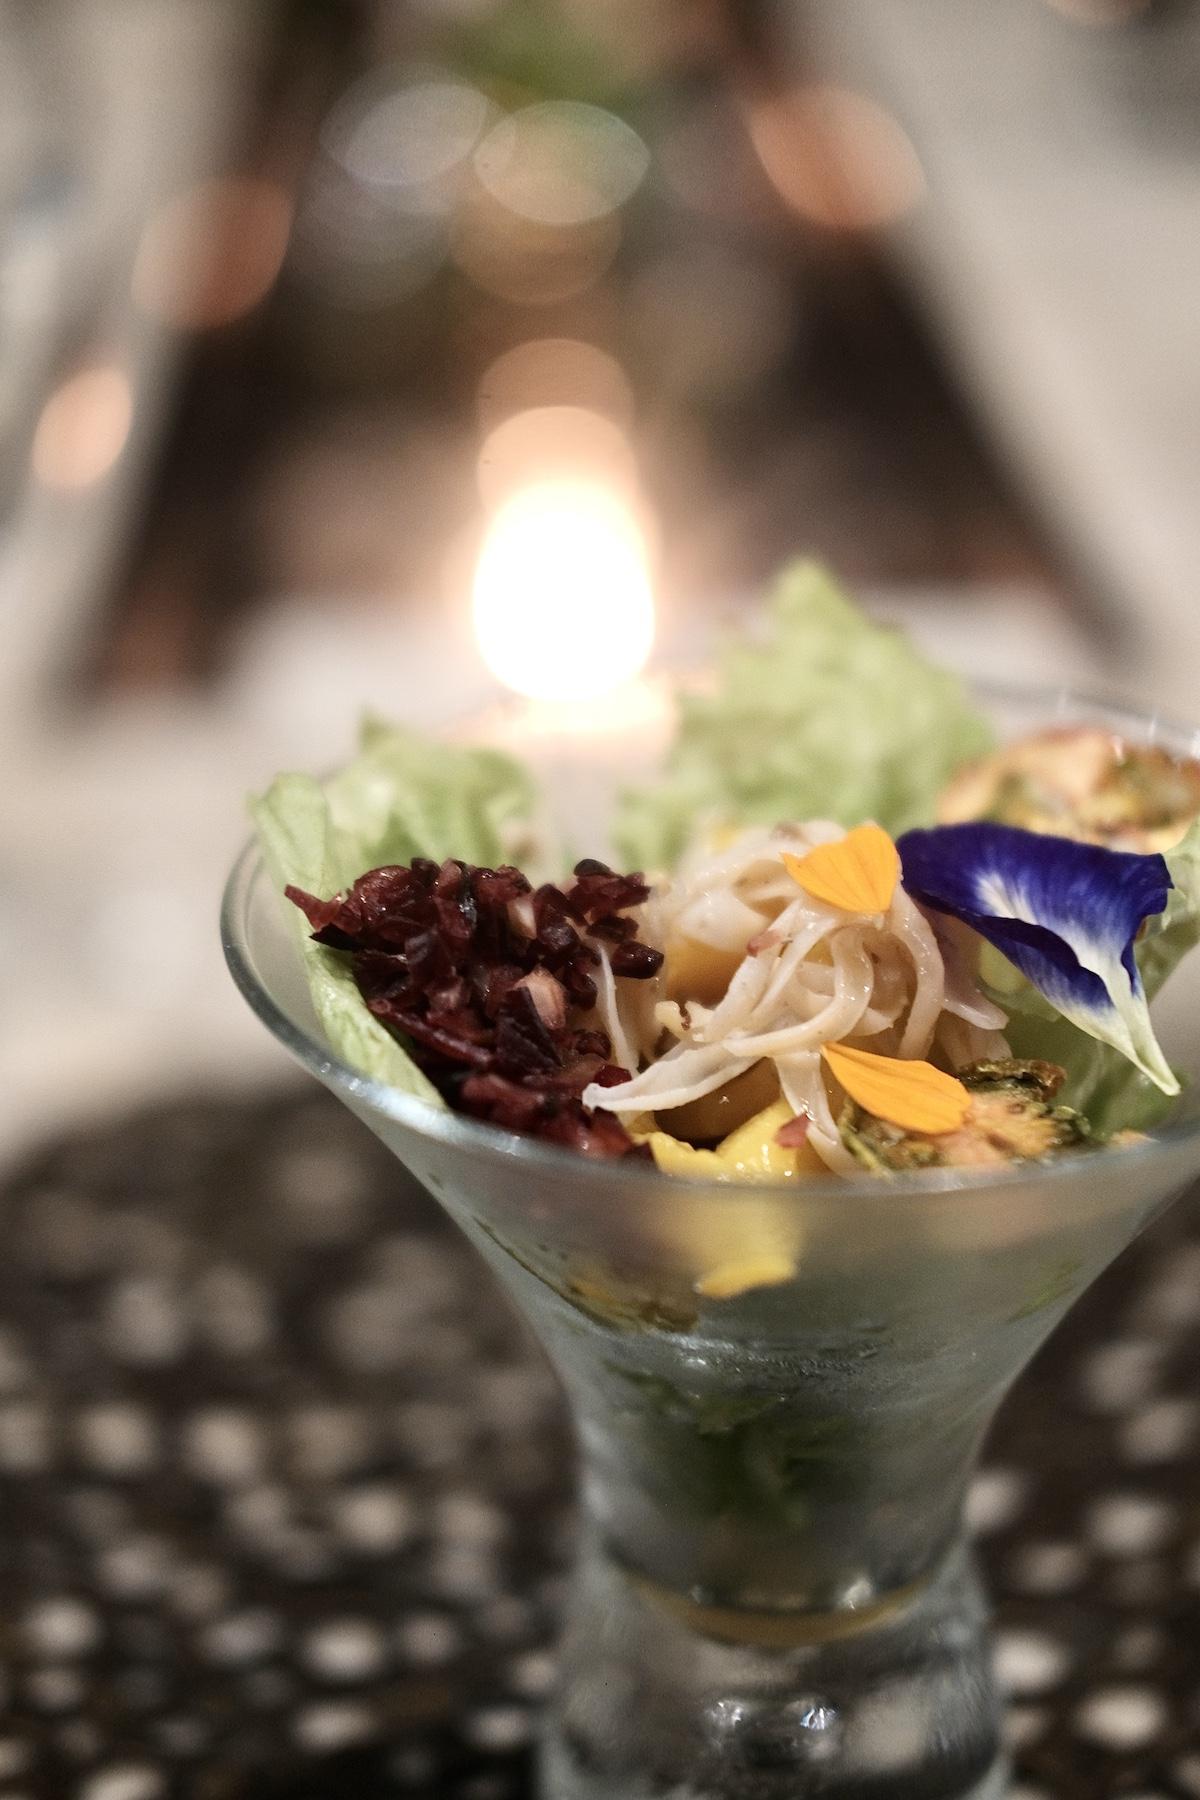 Sea cucumber salad with plum sauce